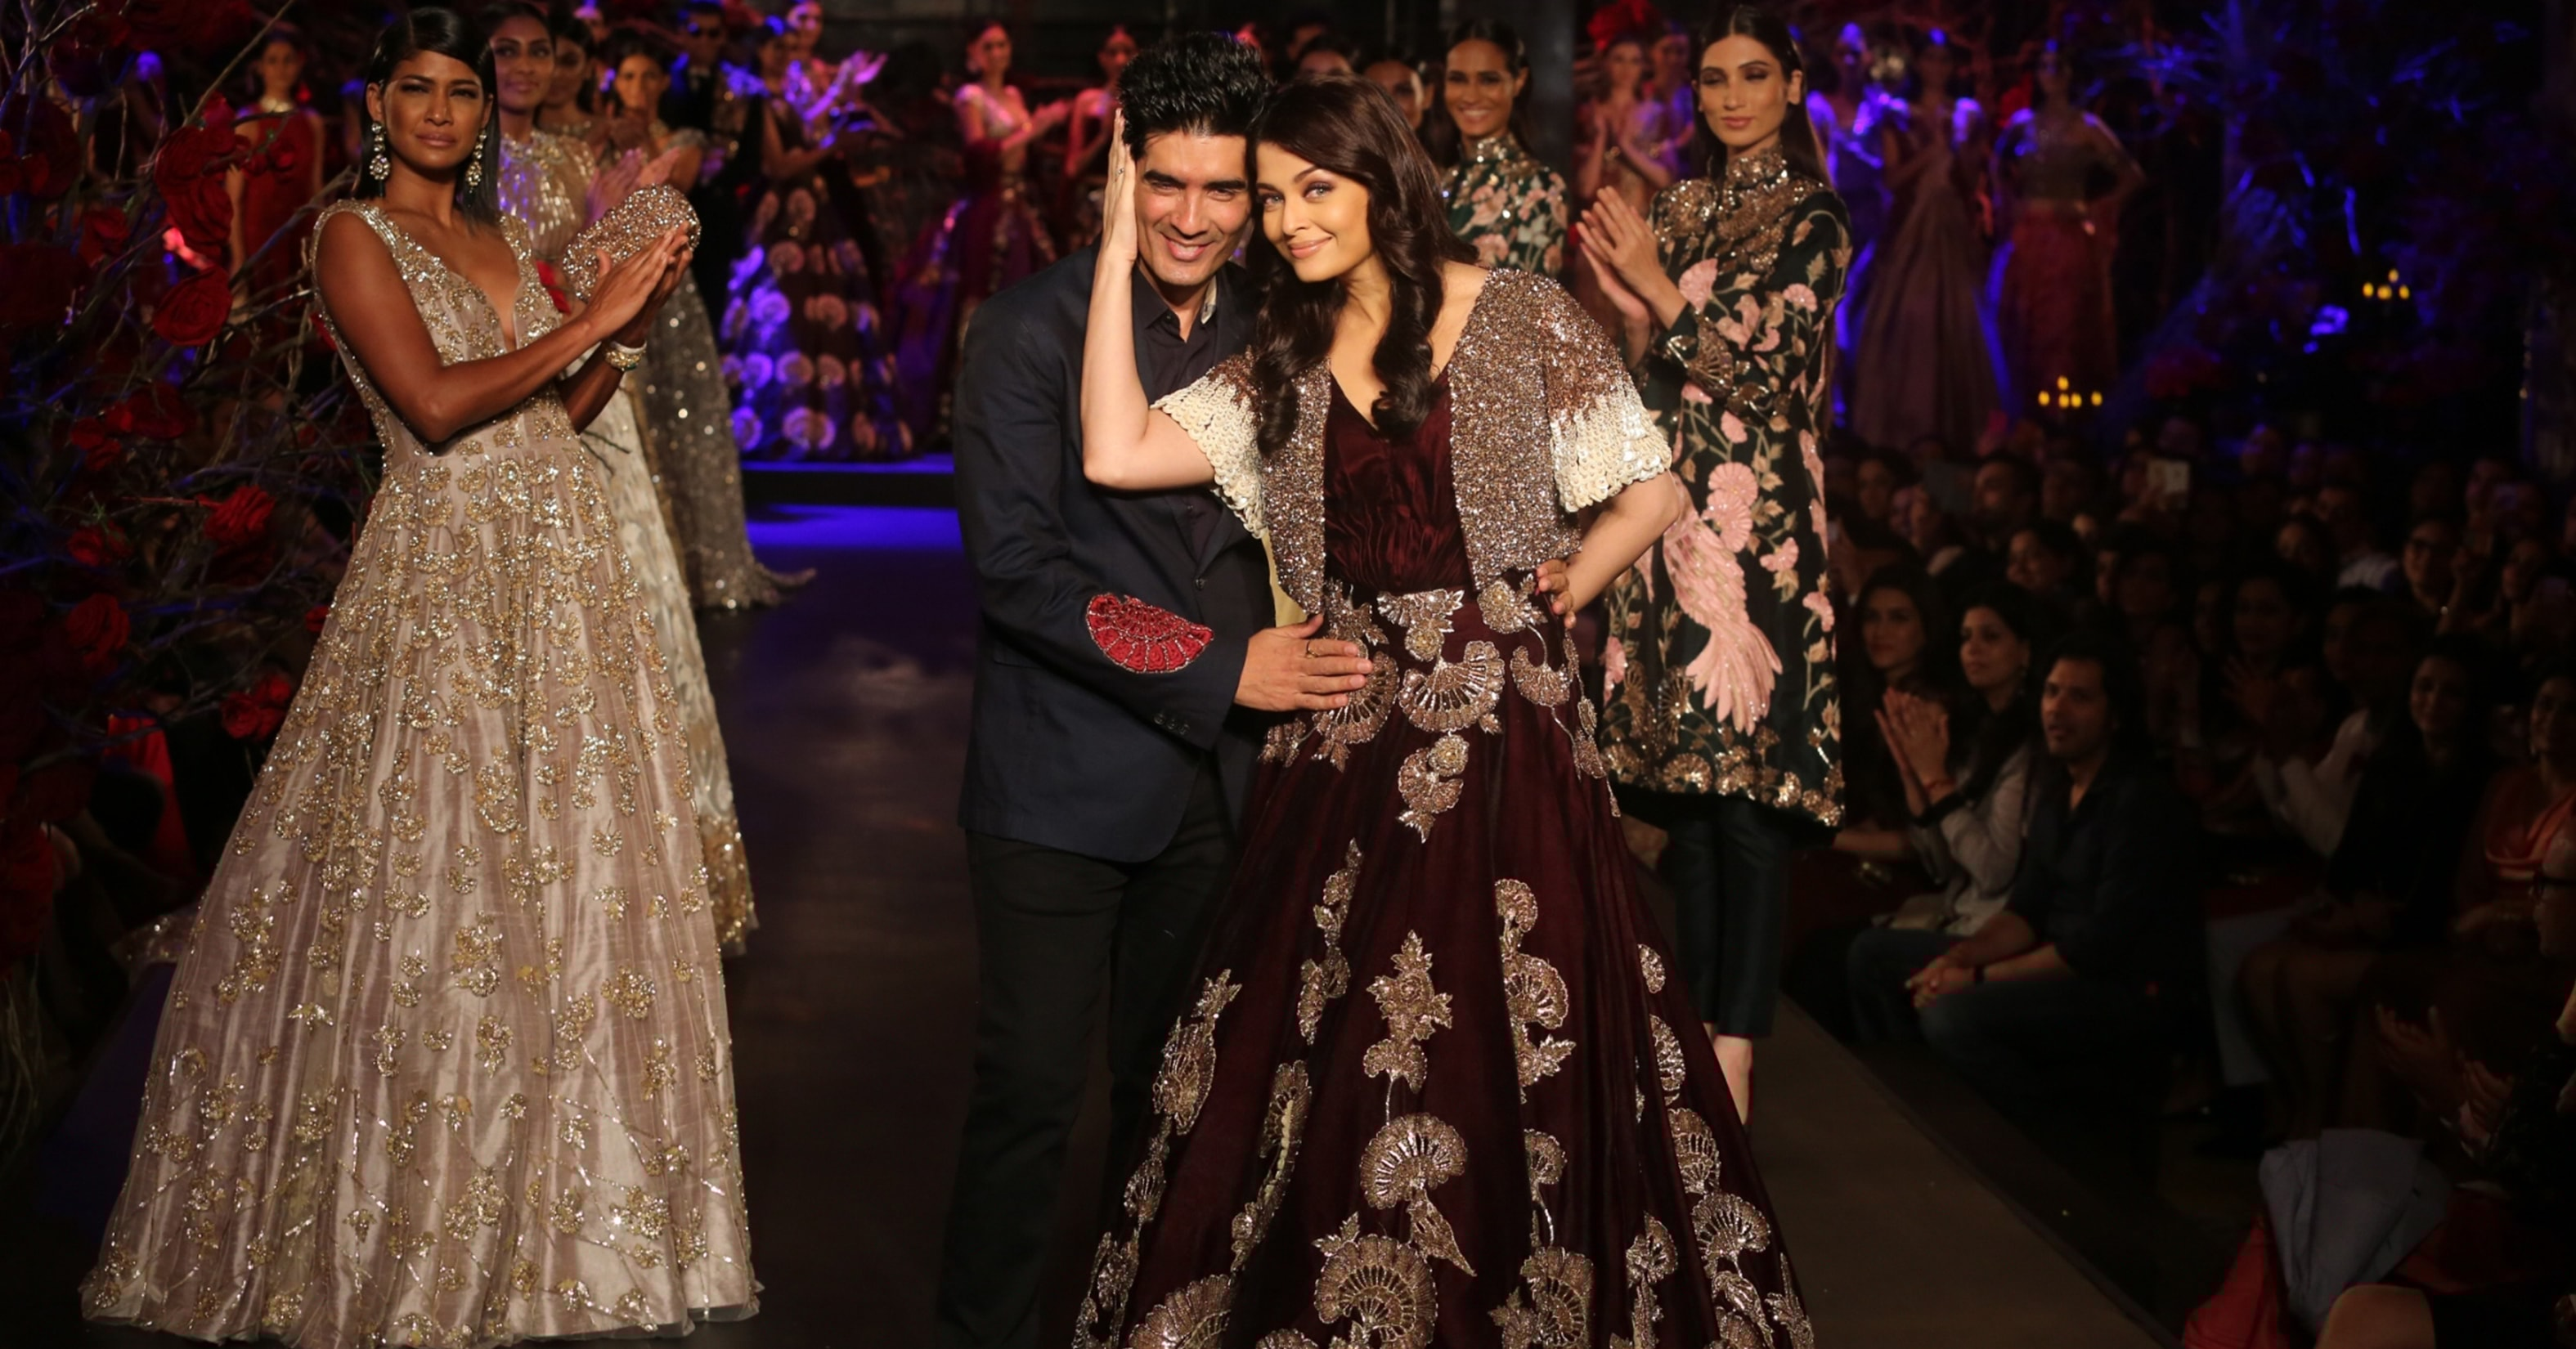 Manish_Malhotra_Aishwarya_Rai_Bachchan_fashion_style